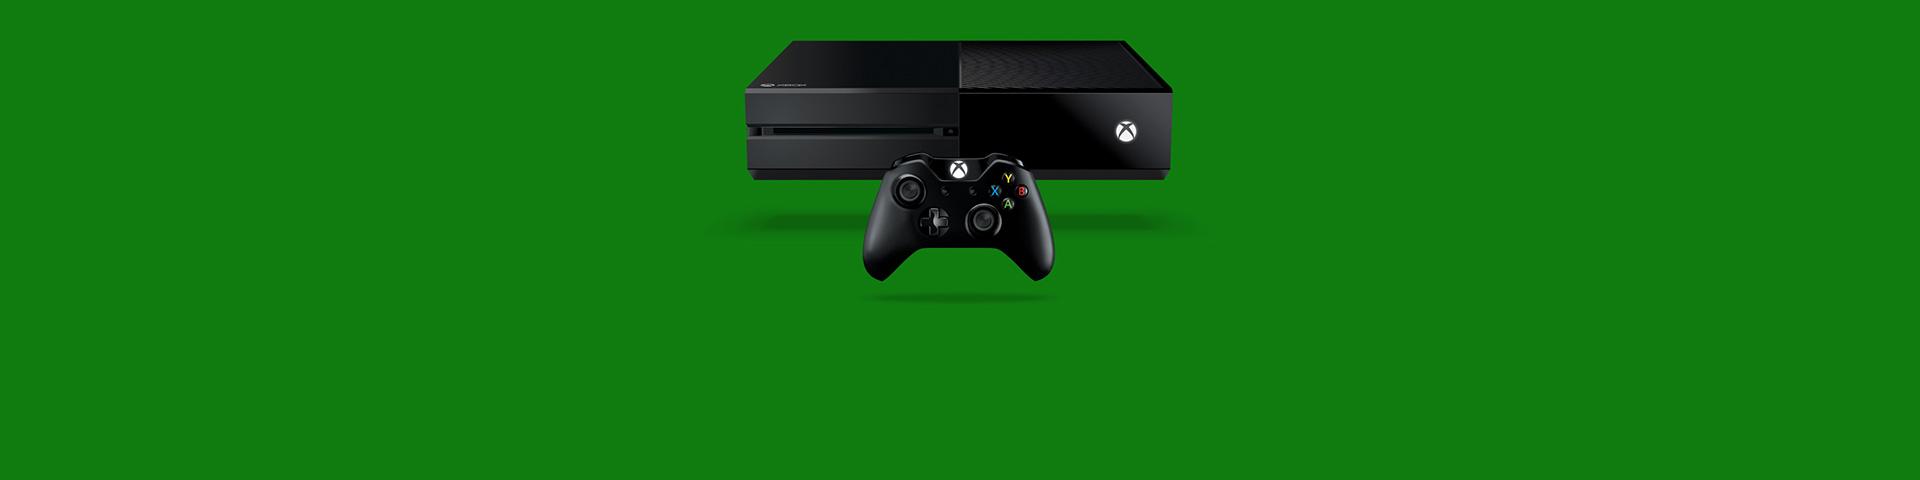 Xbox One -konsoli ja -ohjain